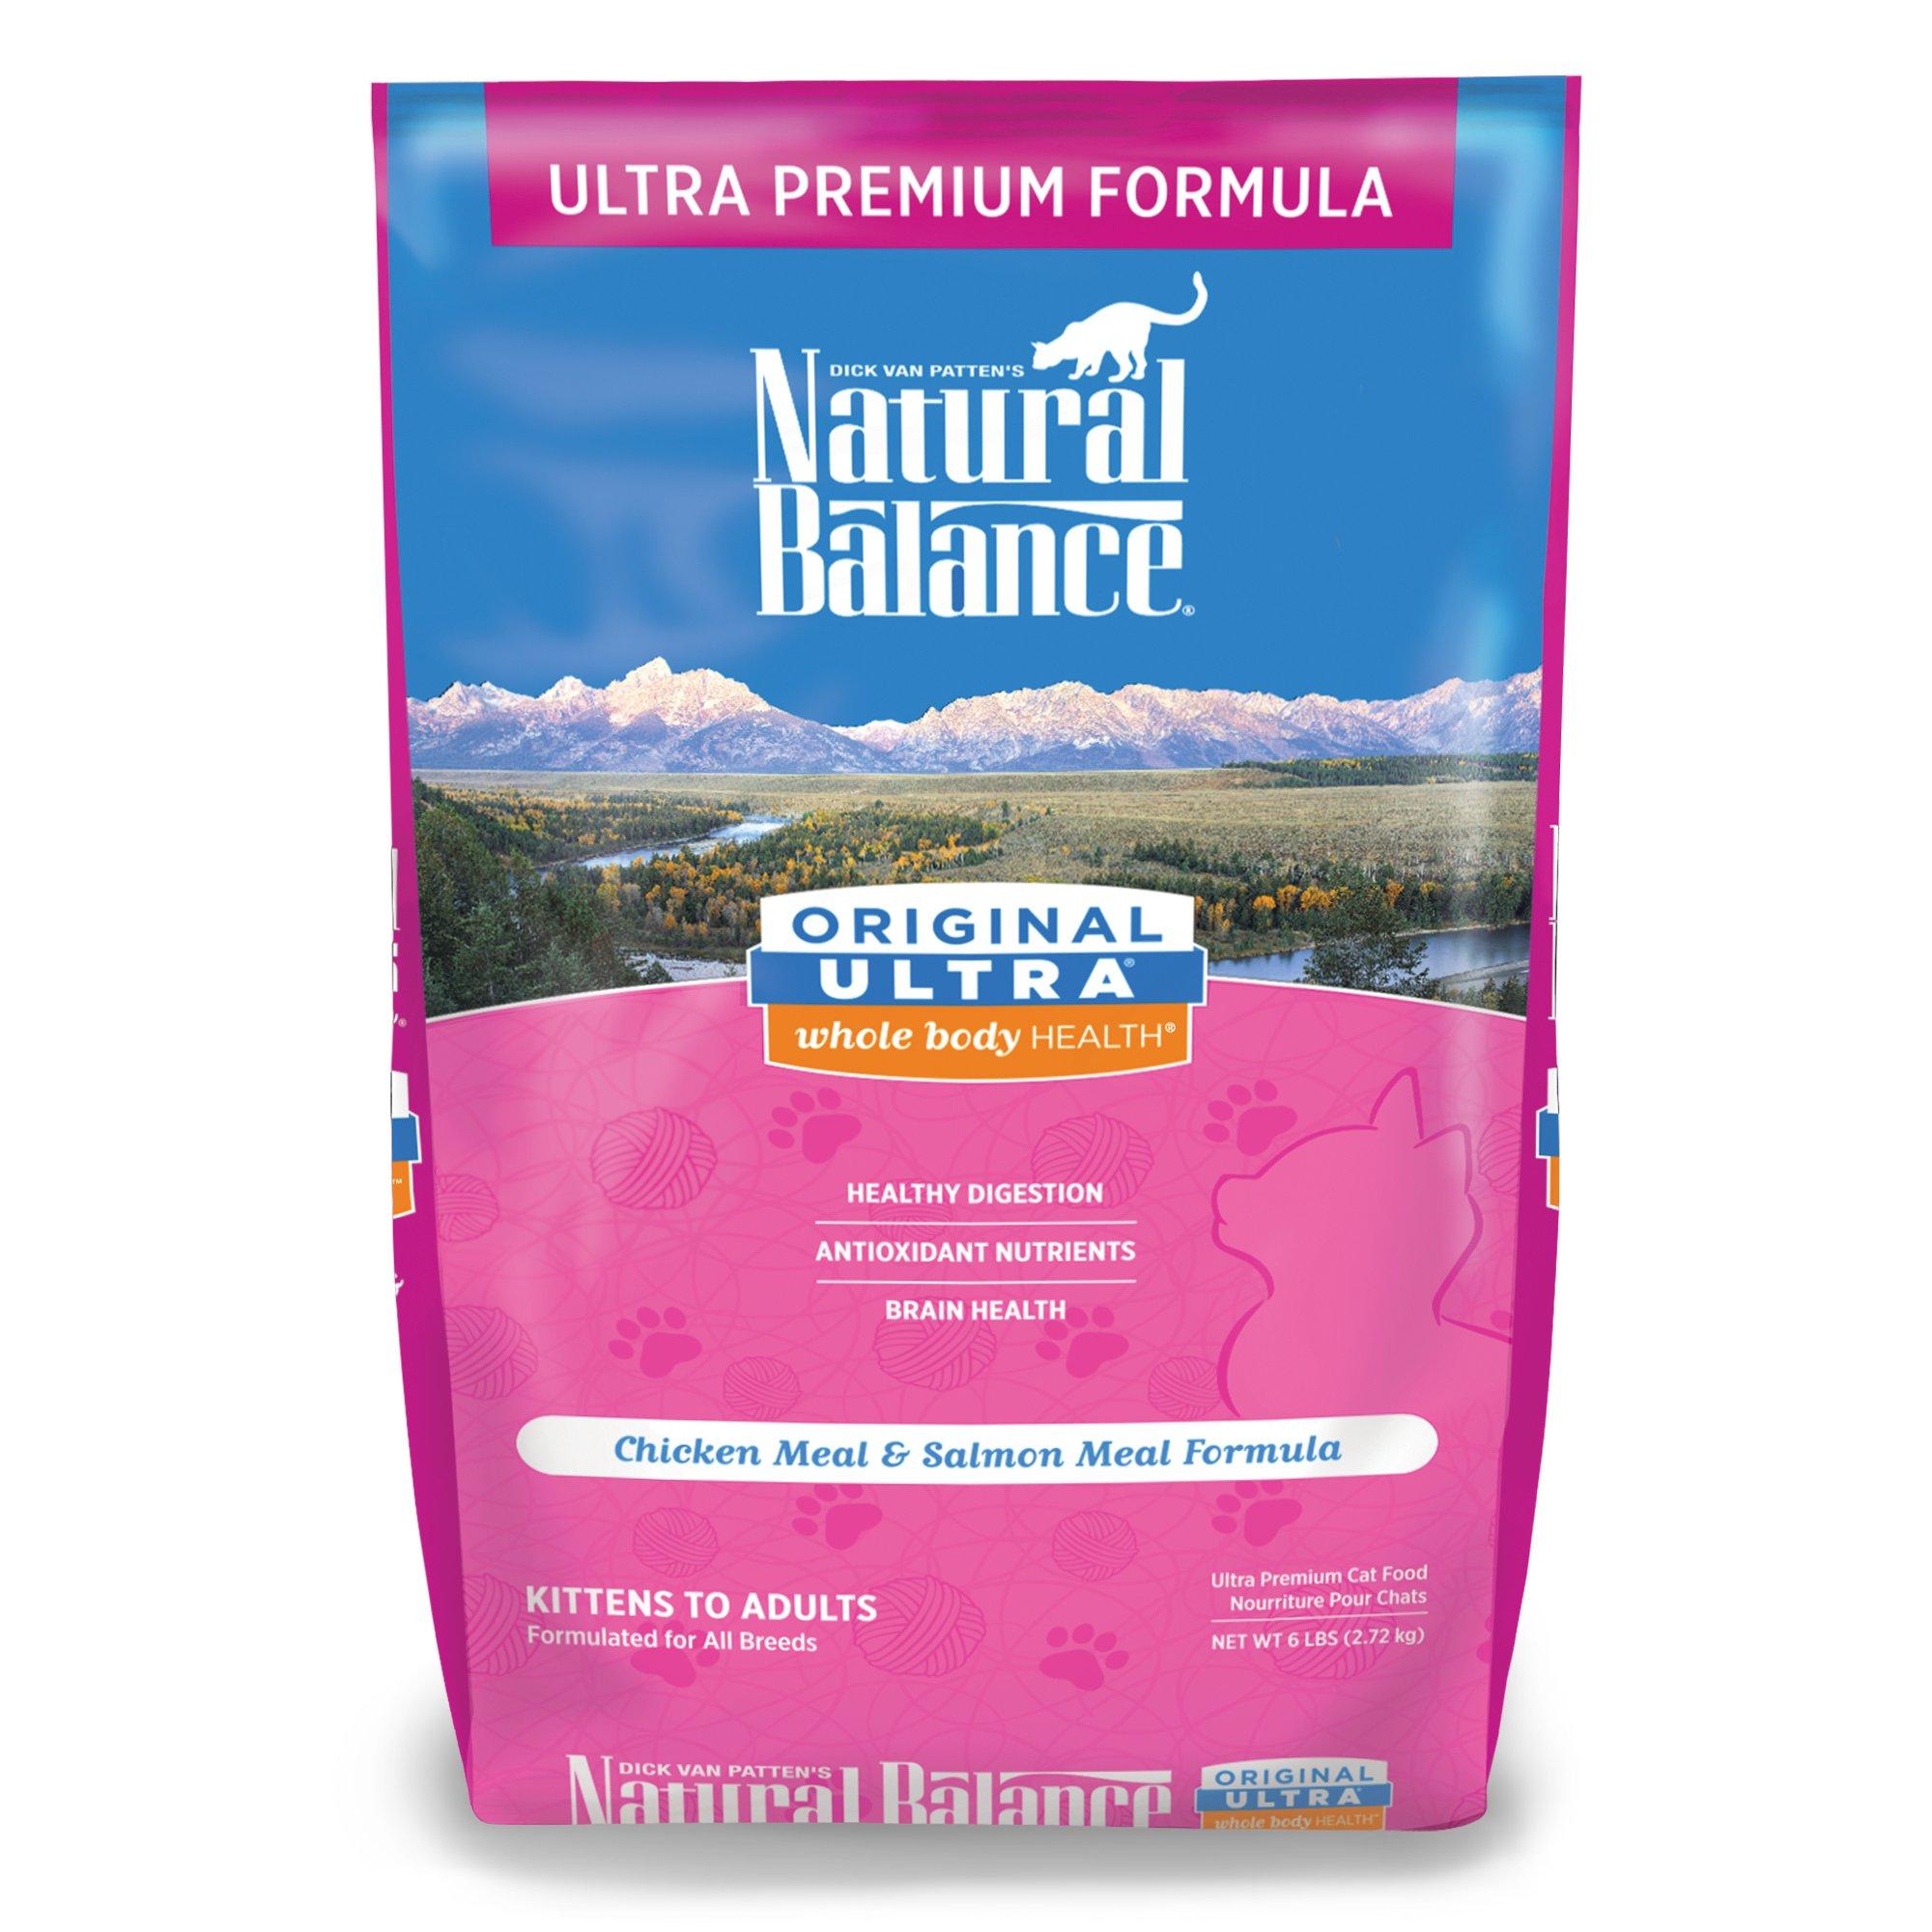 Natural Balance Original Ultra Whole Body Health Cat Food